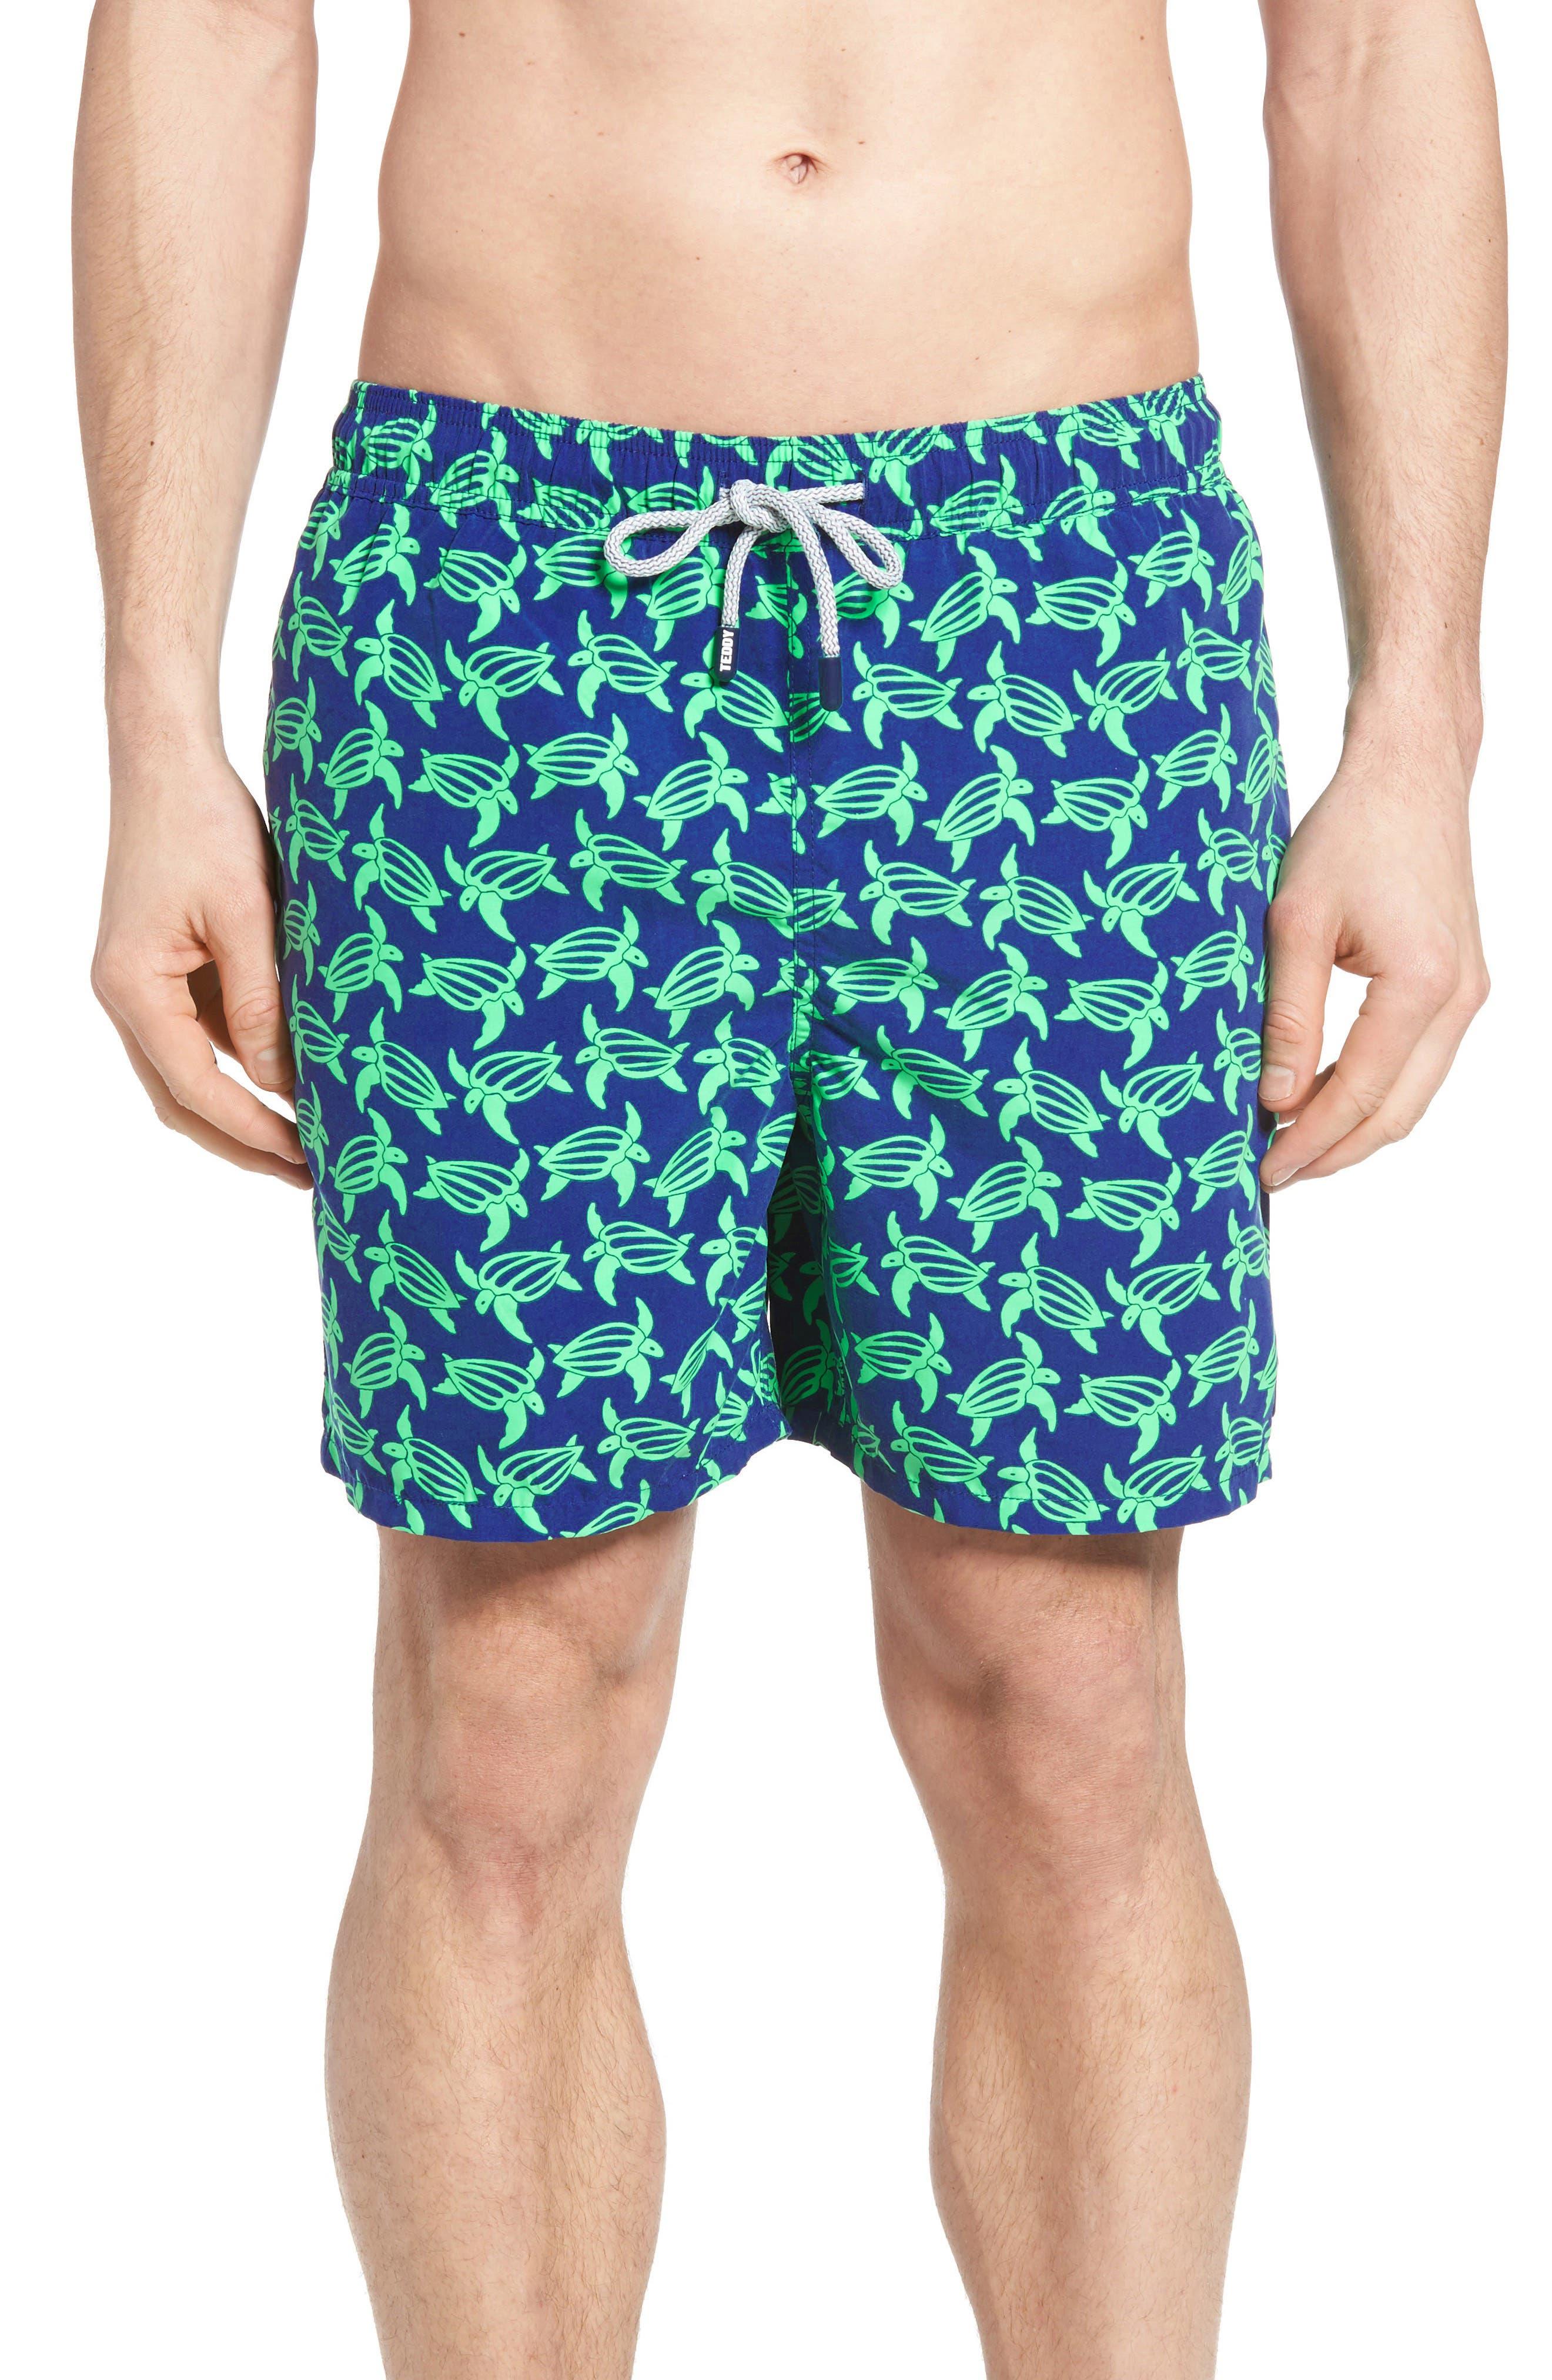 Turtle Print Swim Trunks,                         Main,                         color, Navy Green